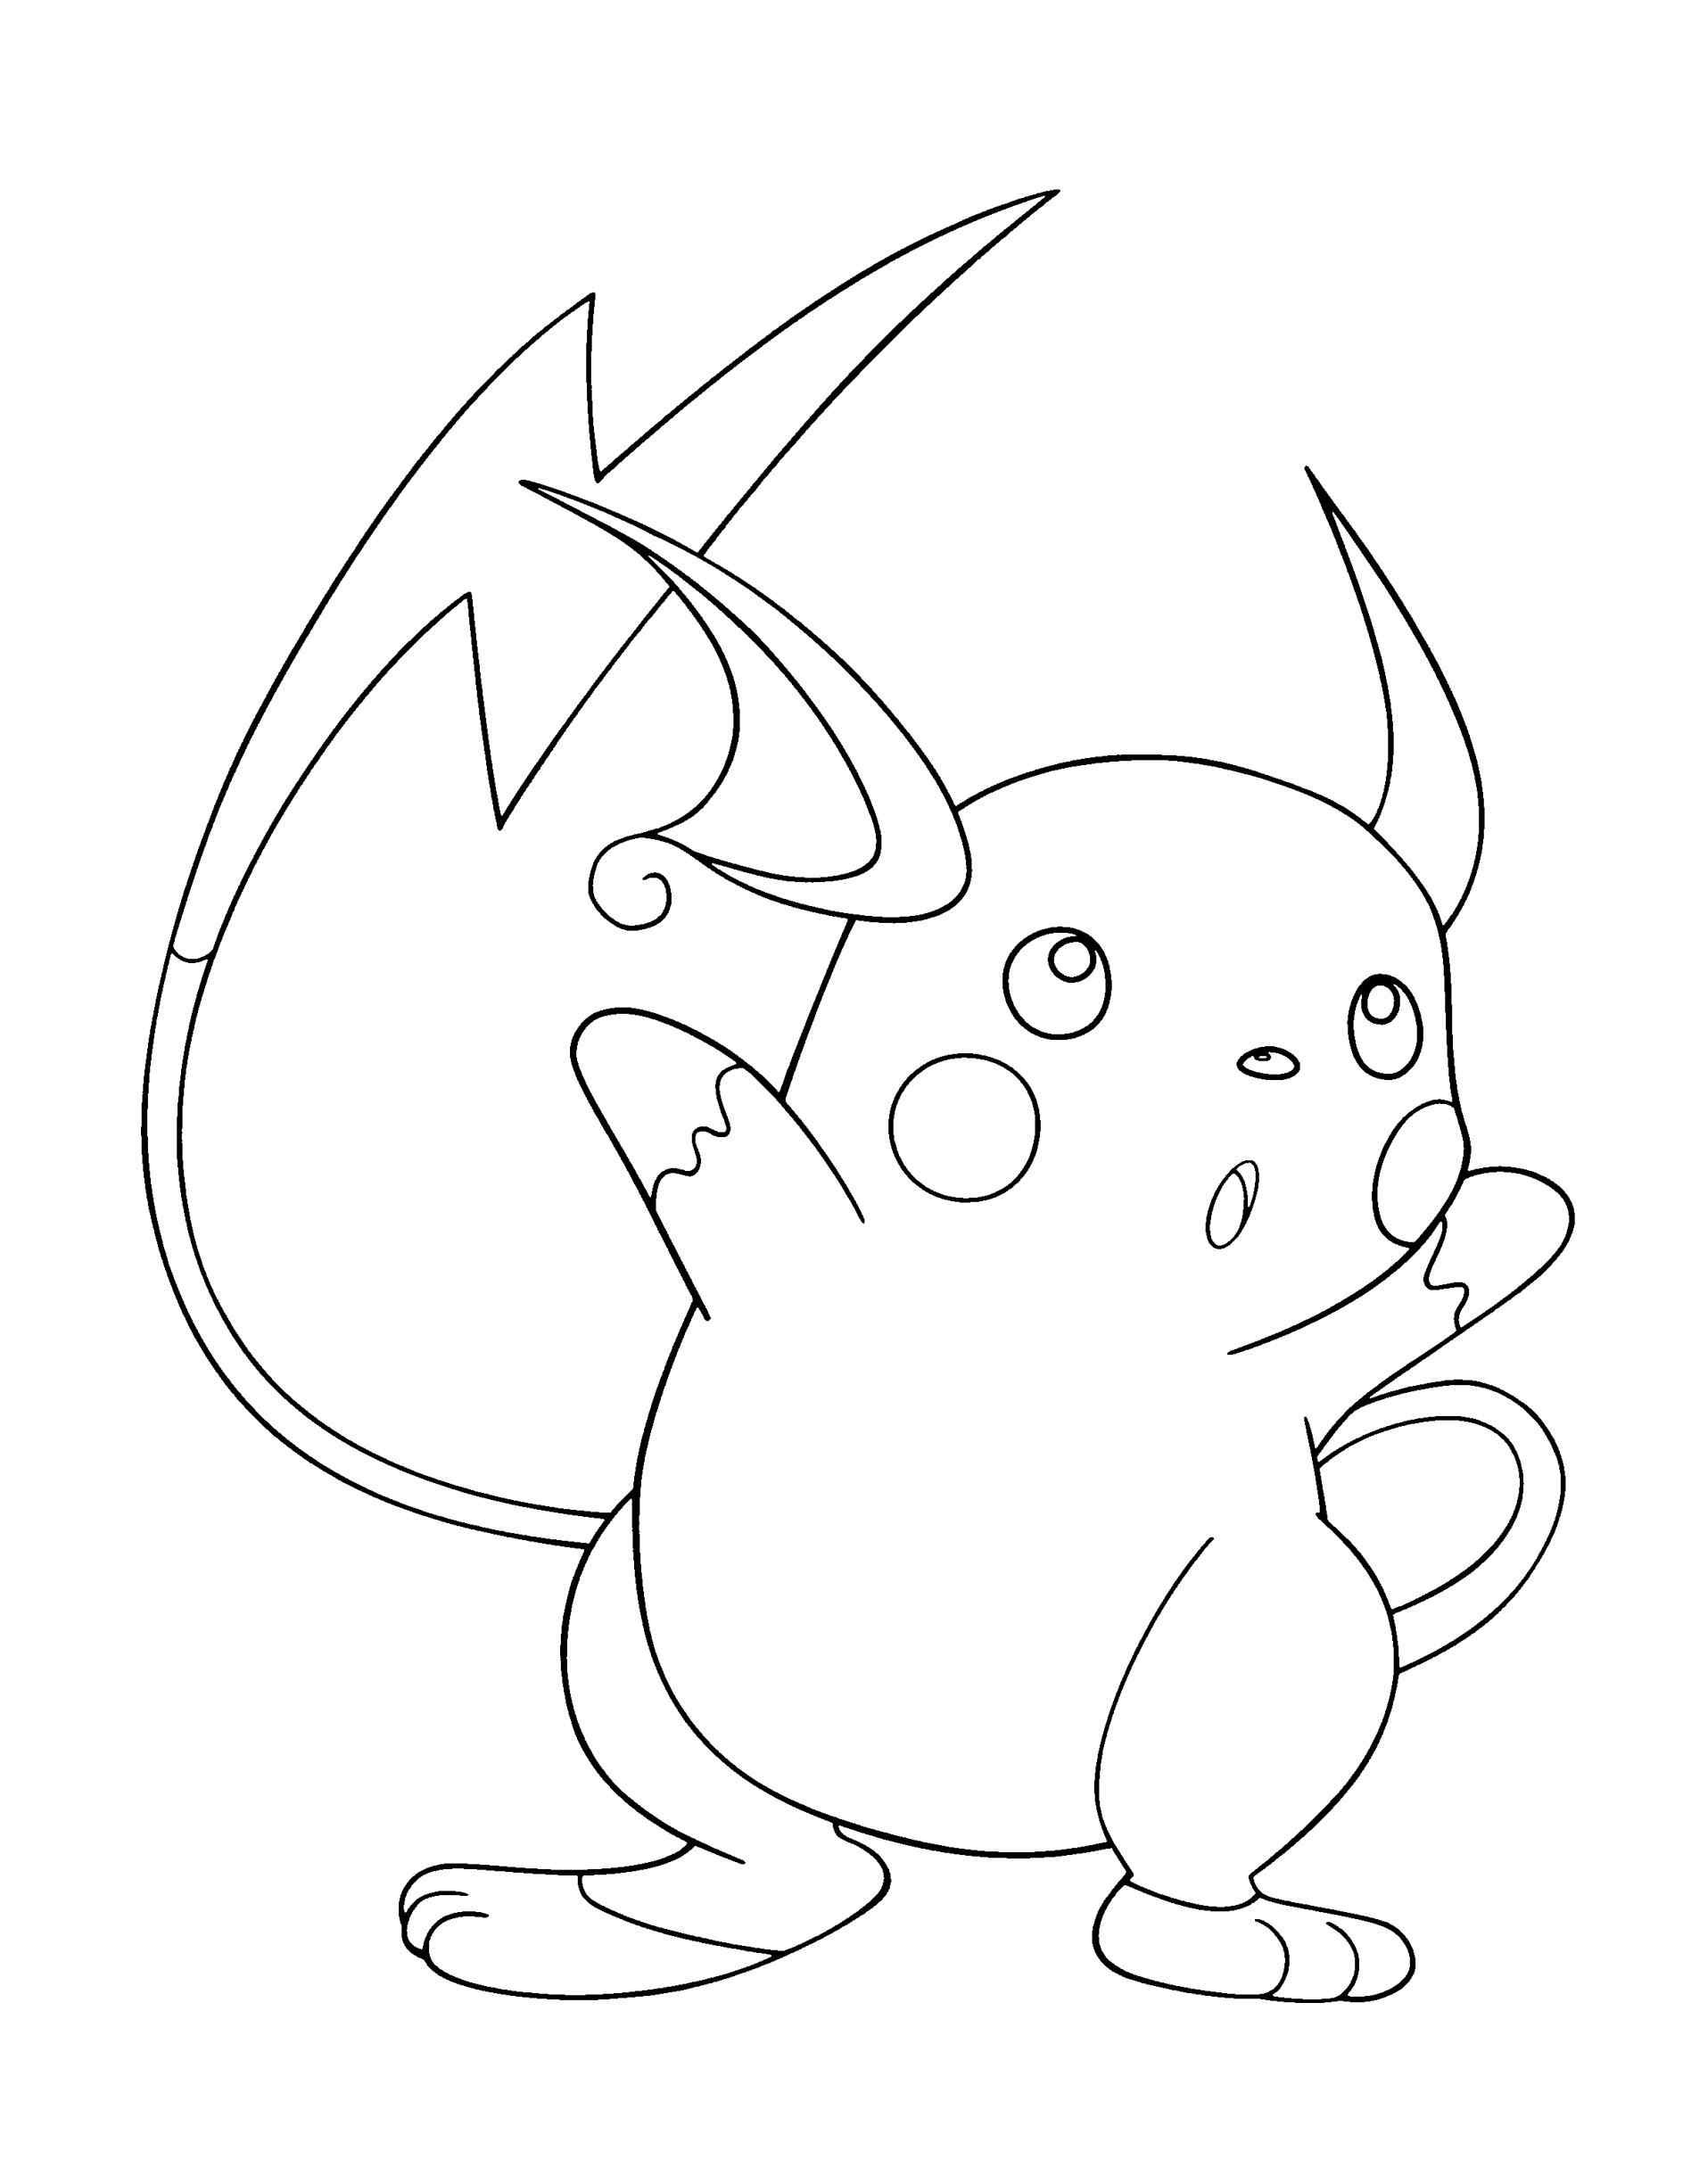 Raichu Pokemon Coloring Pages at GetDrawings.com | Free ...